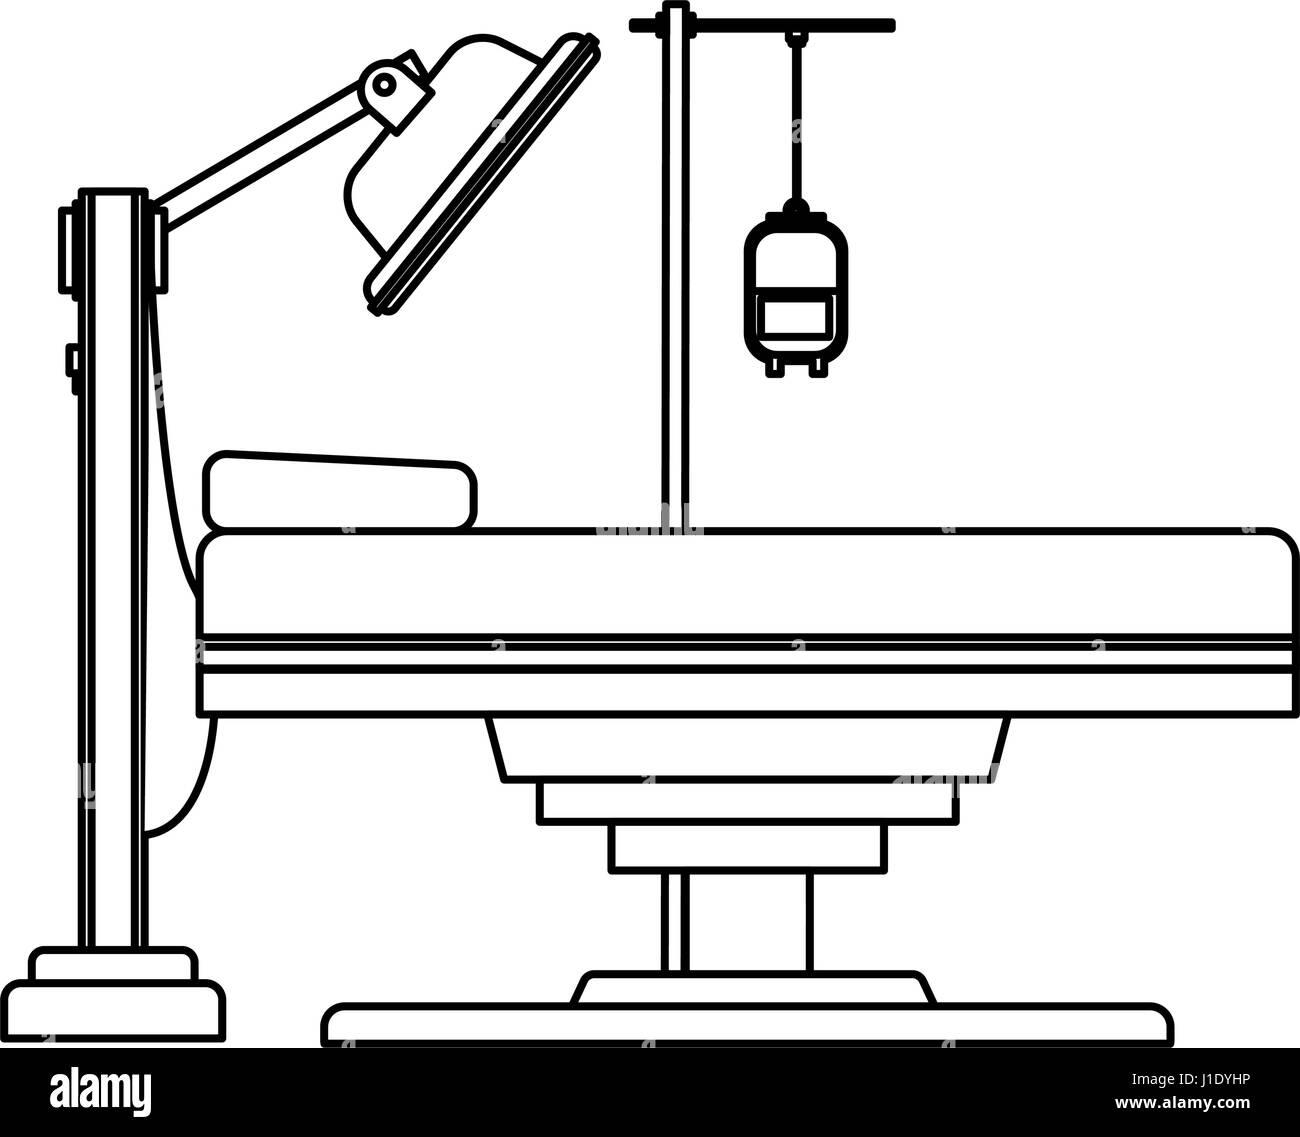 Gurney Or Hospital Bed Icon Image